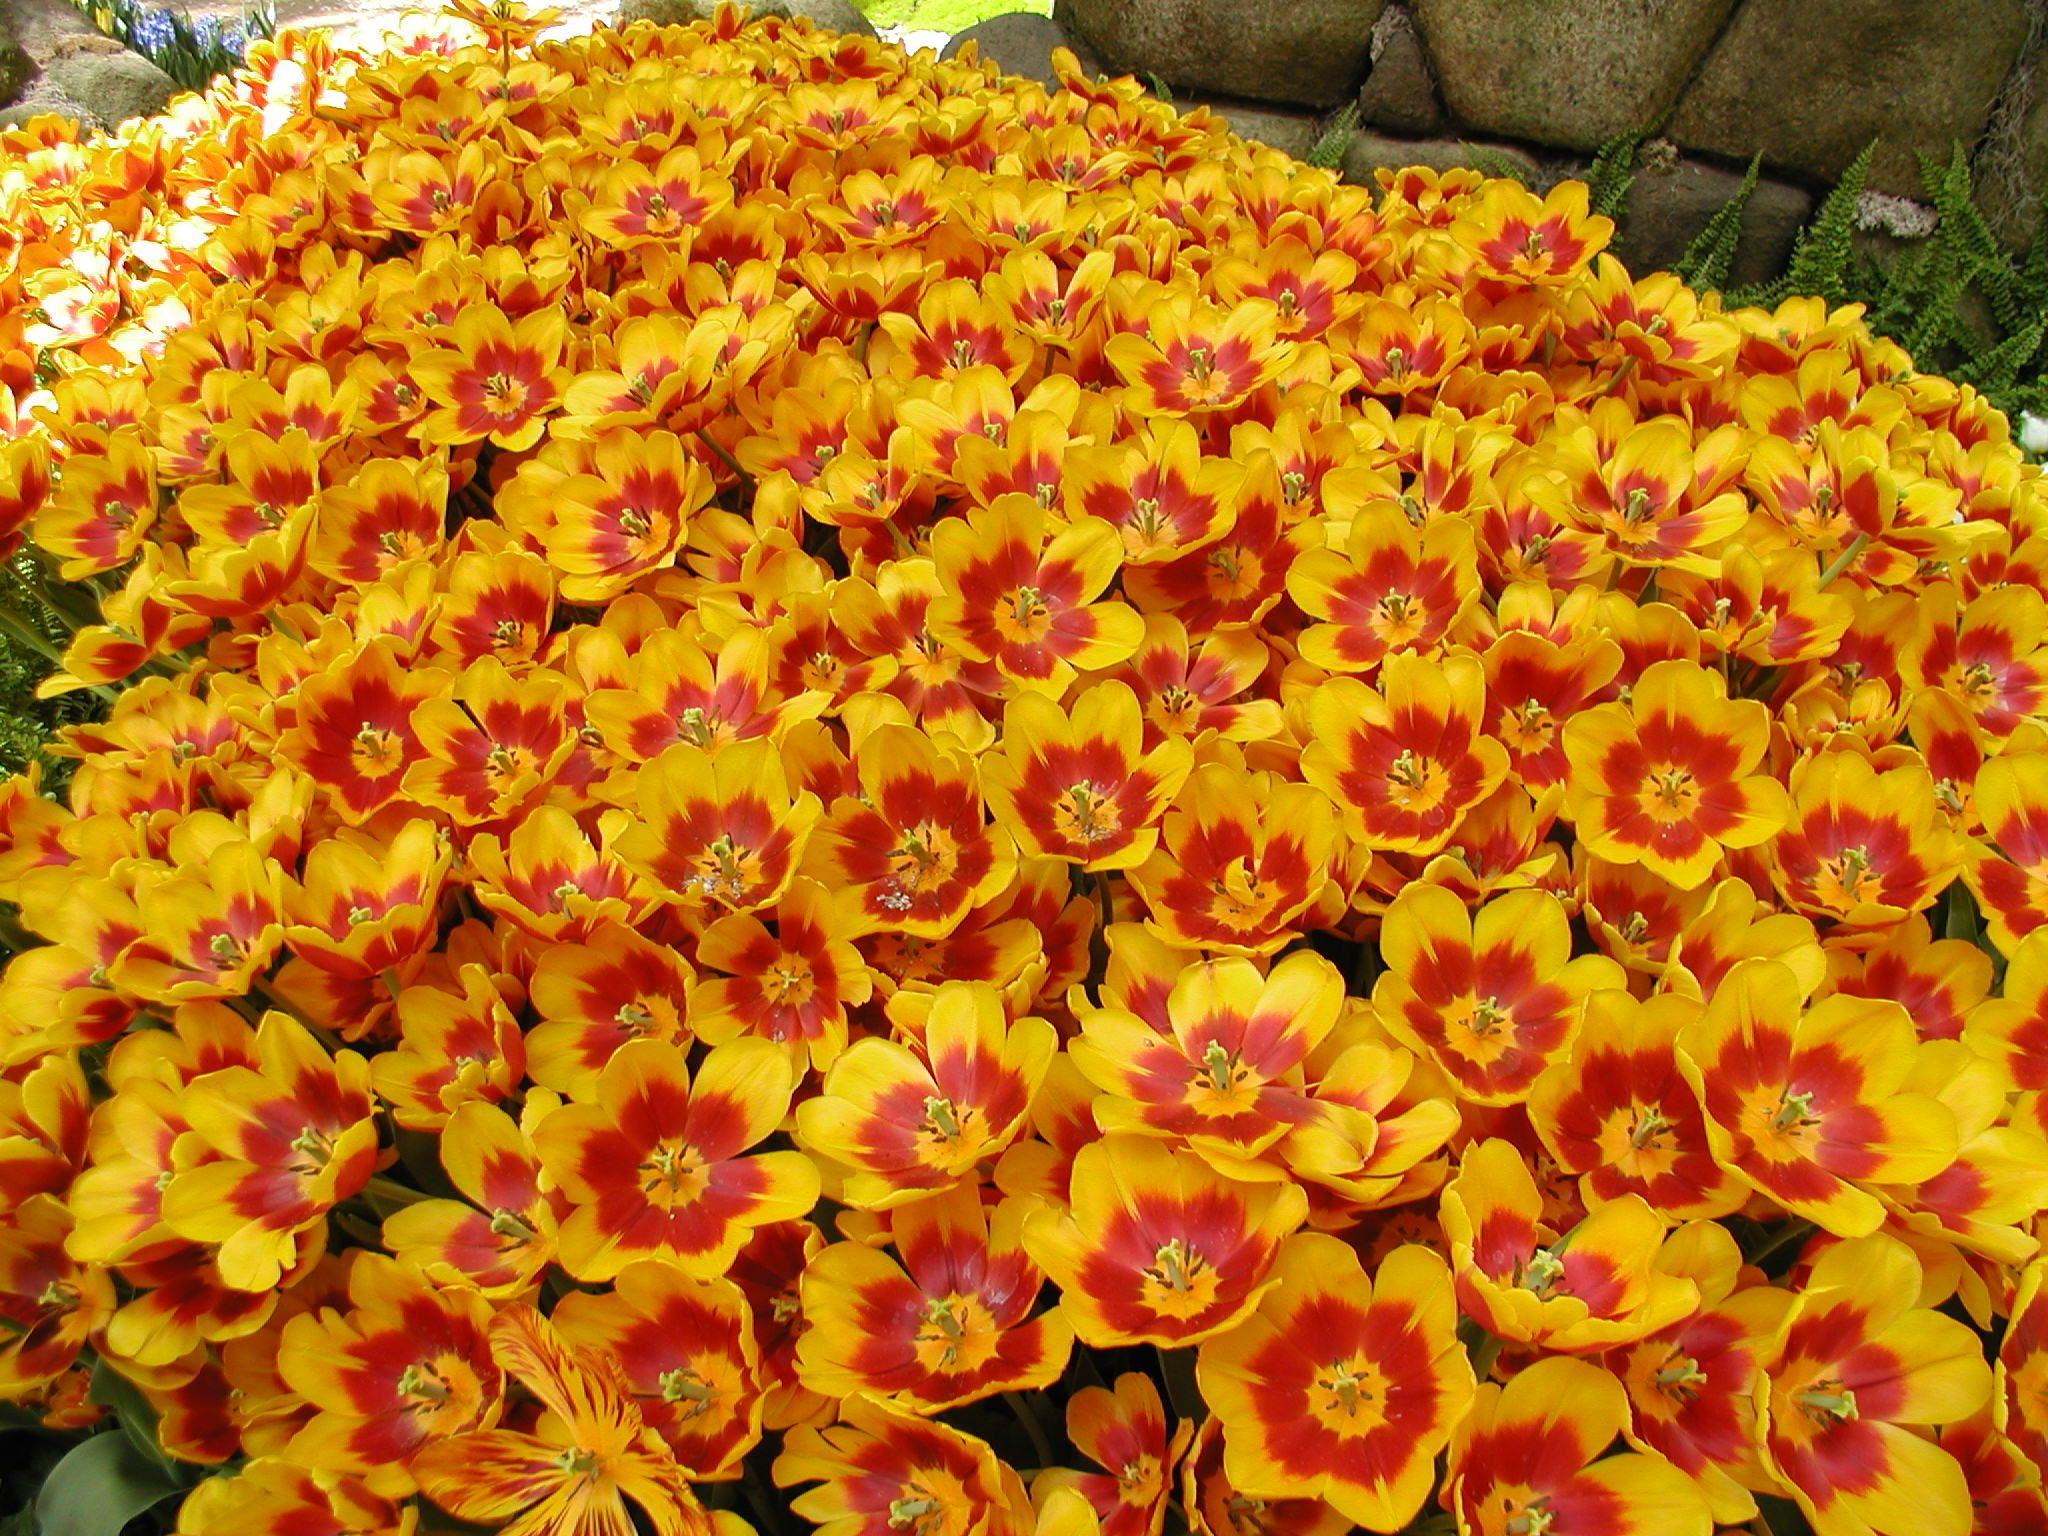 Yellow orange flowers las vegas orange flowers yellow orange flowers las vegas mightylinksfo